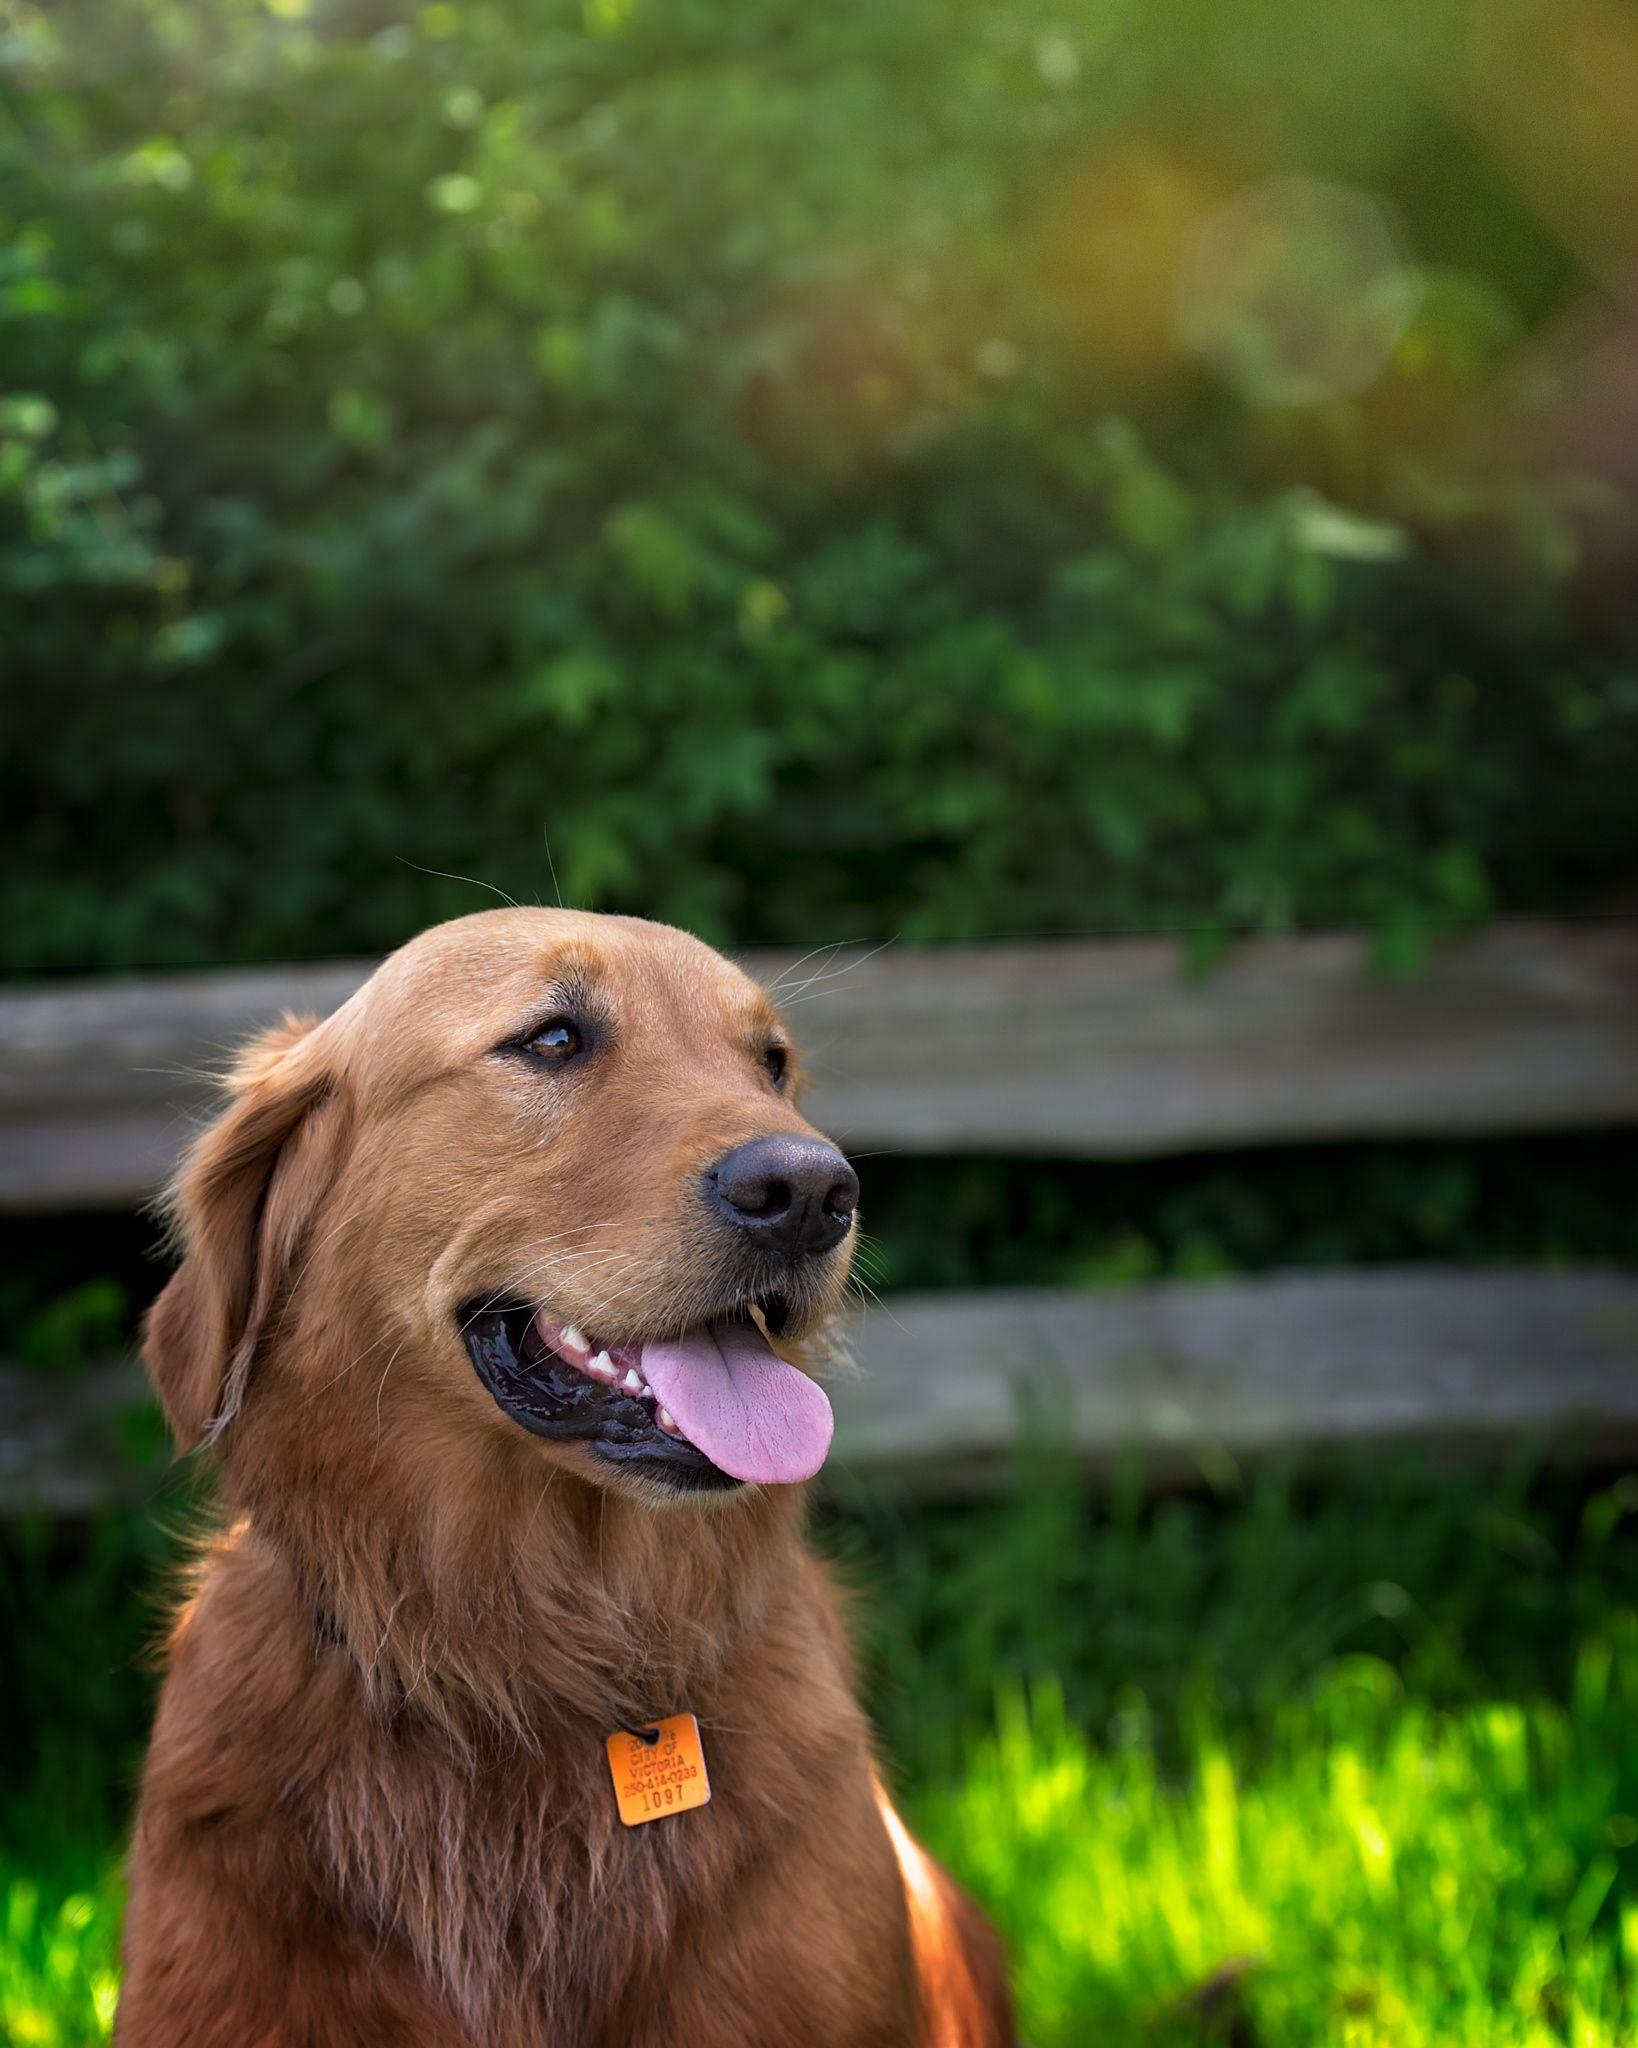 Luke A Field Retriever Dogs Puppies Dog Photography Dogs